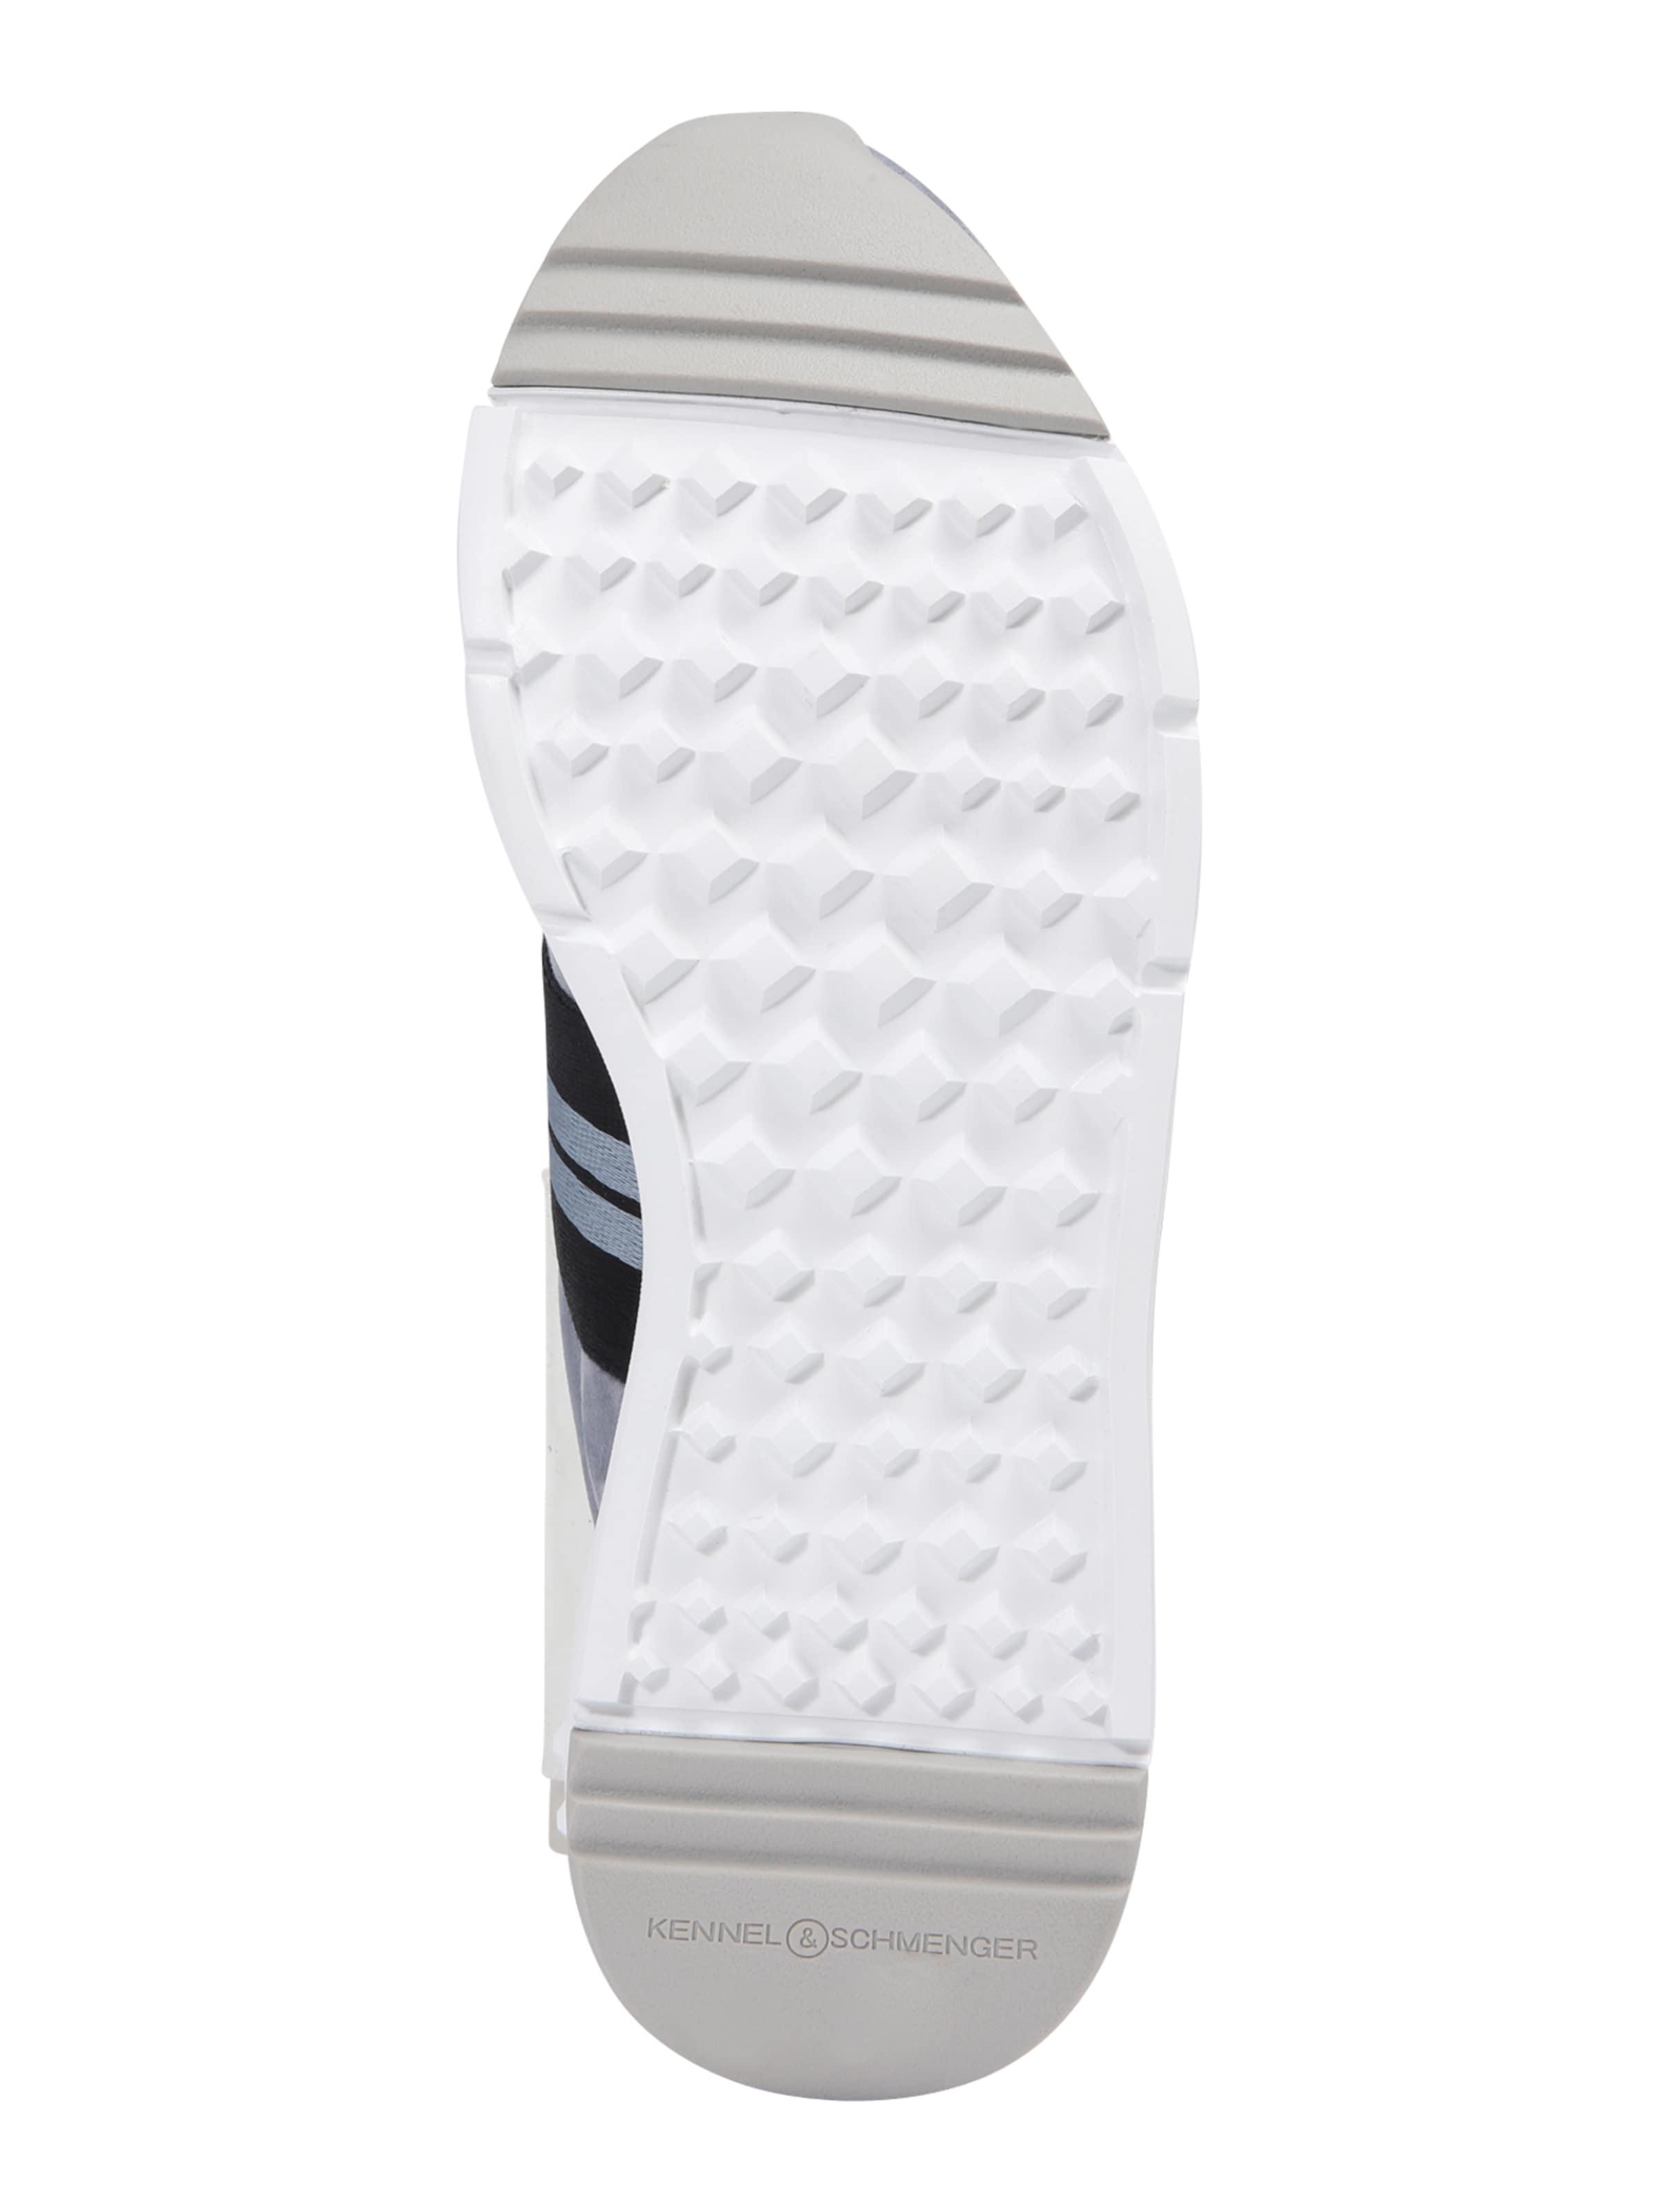 Kennelamp; 'speed' In Schmenger Sneaker RauchblauAqua D9HIW2YE